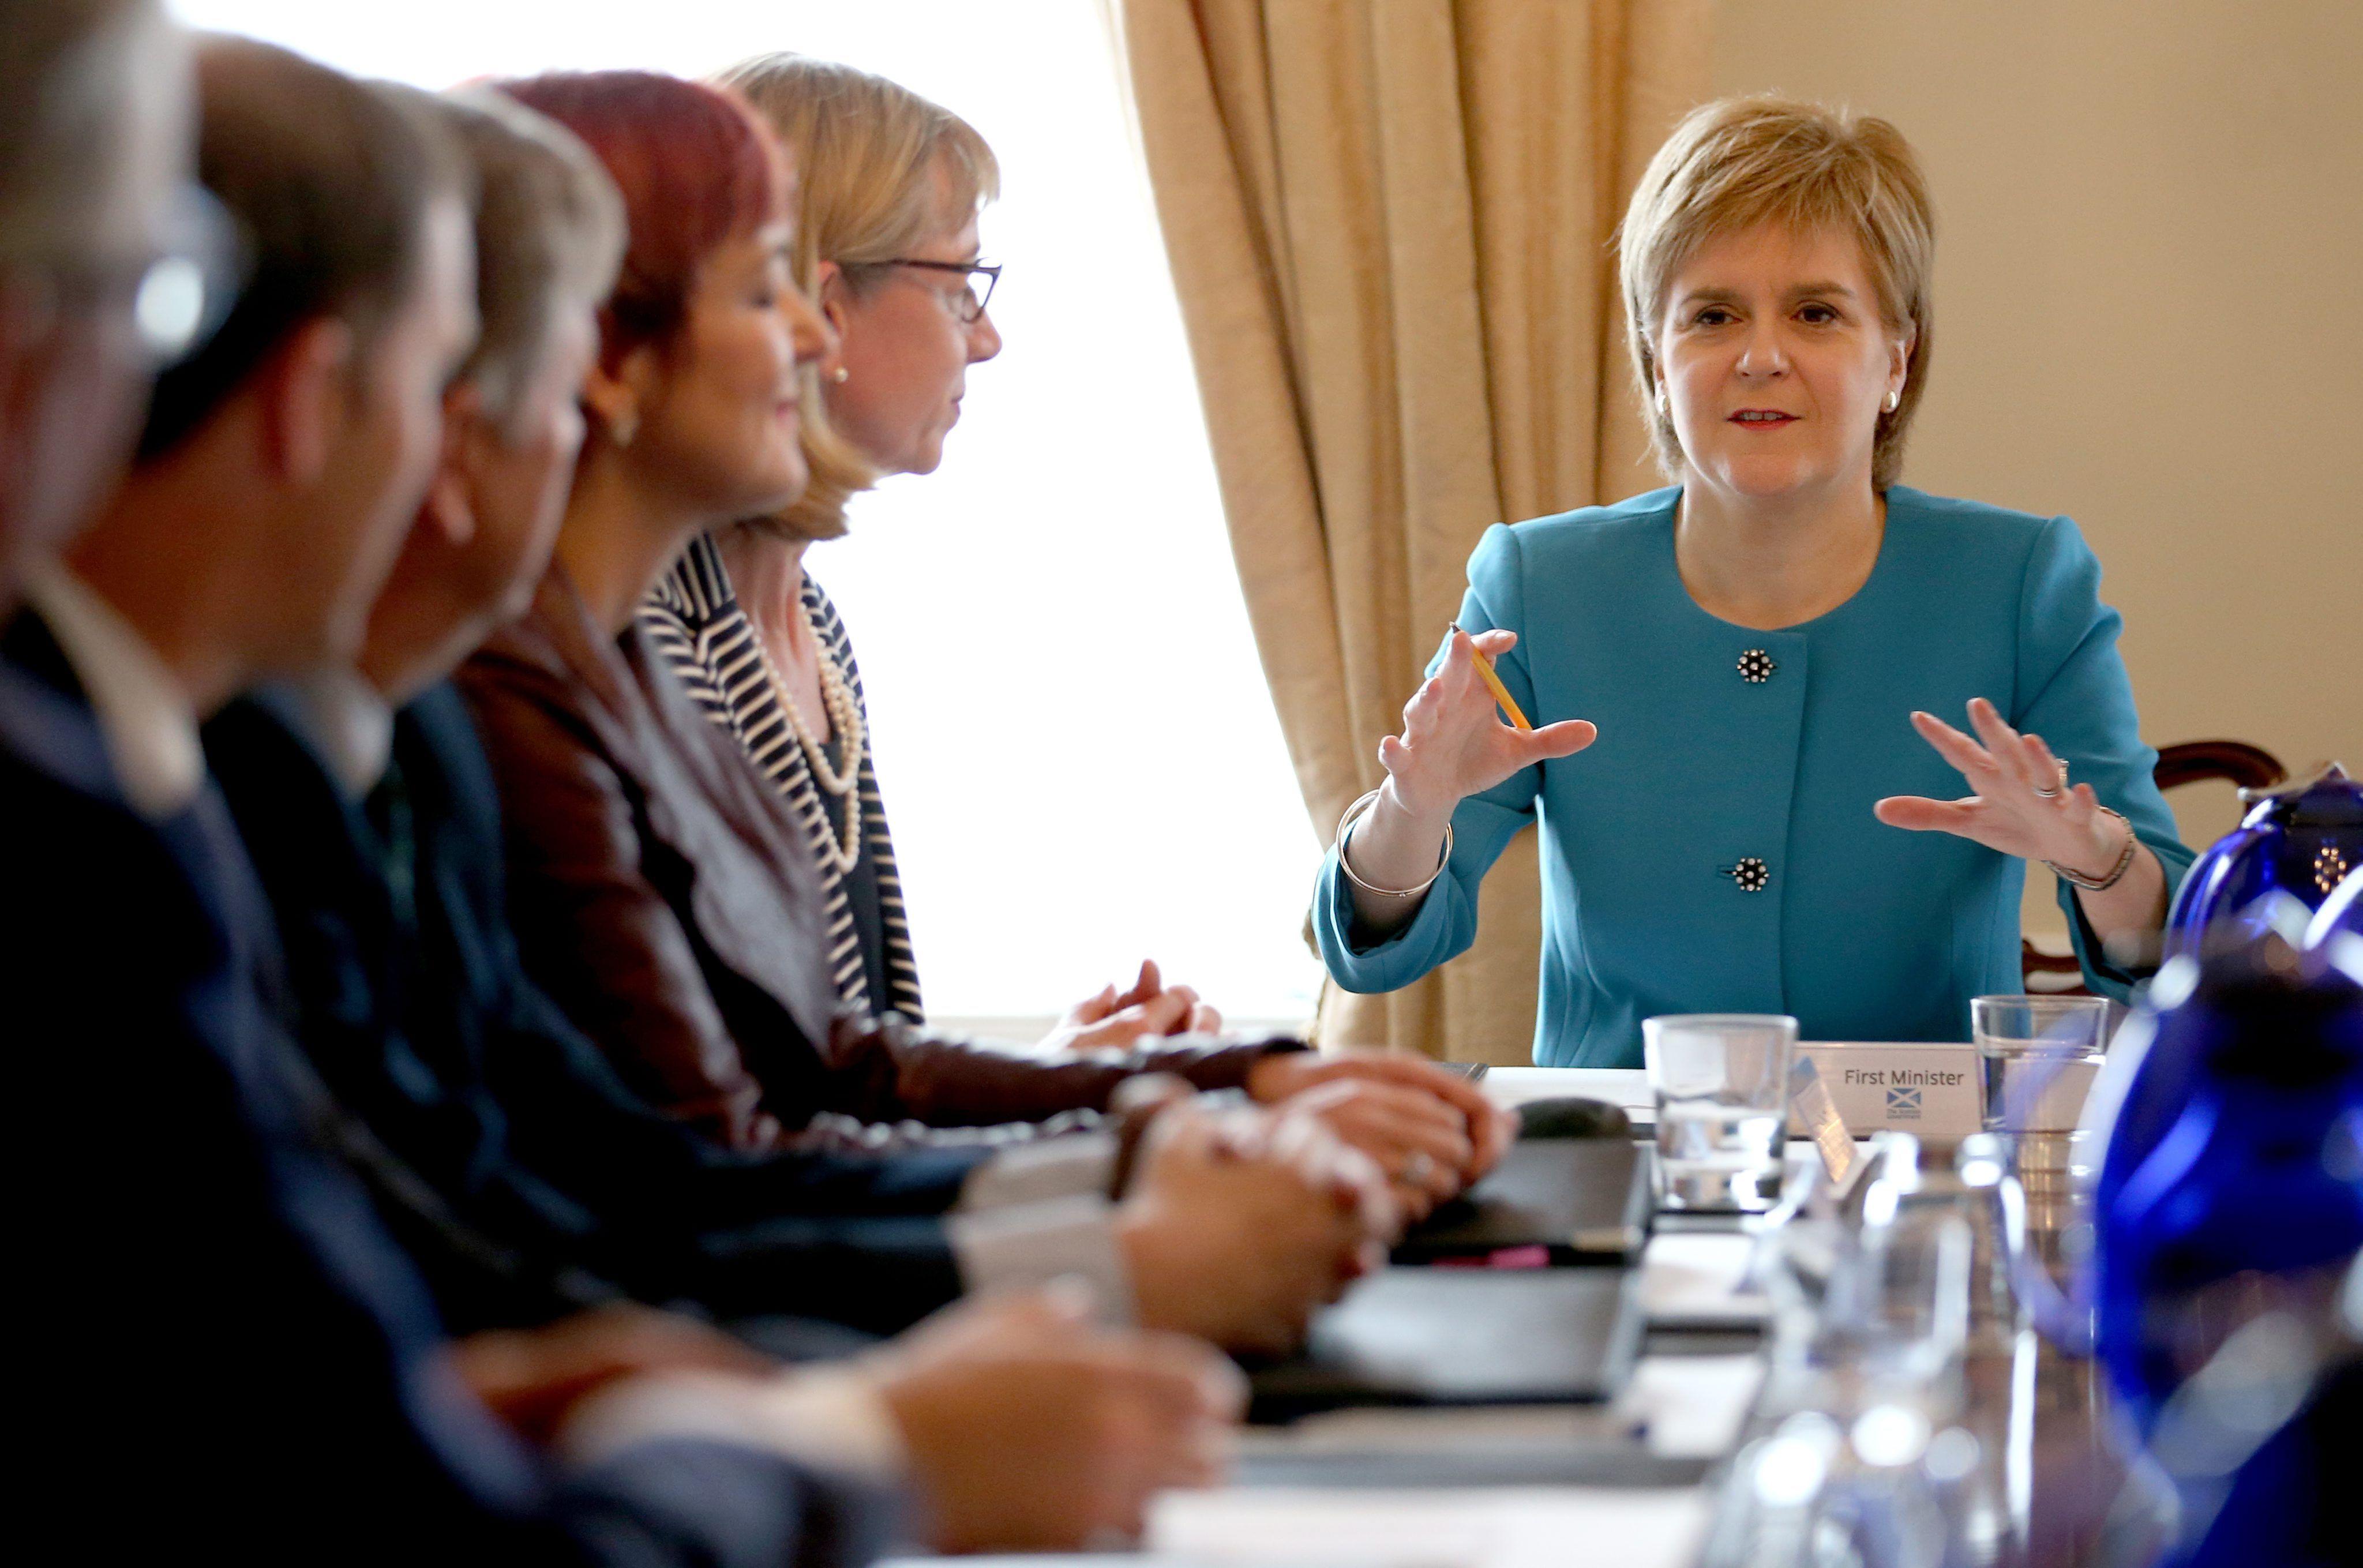 sturgeon membres govern escoces efe